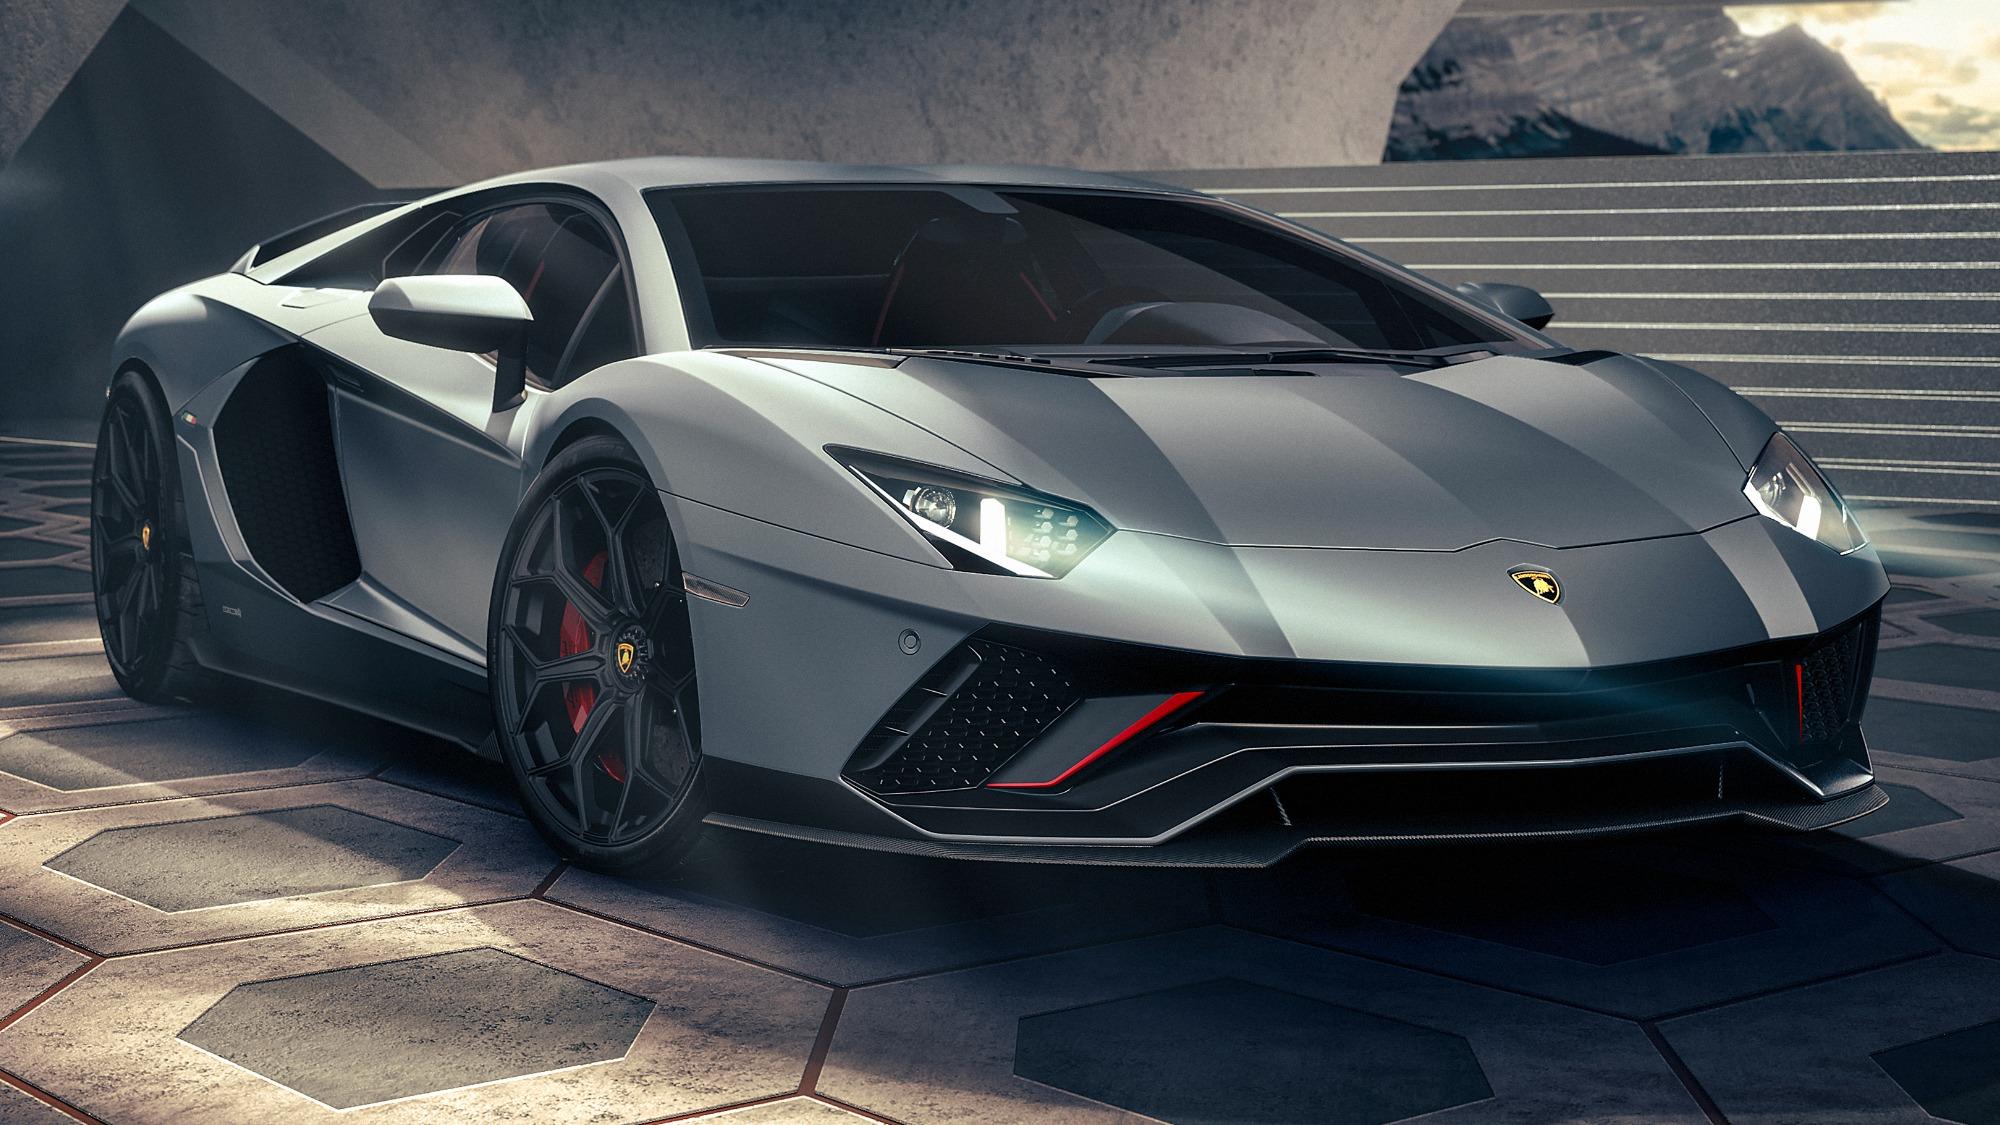 Lamborghini Aventador Ultimae prata visto 3/4 de frente